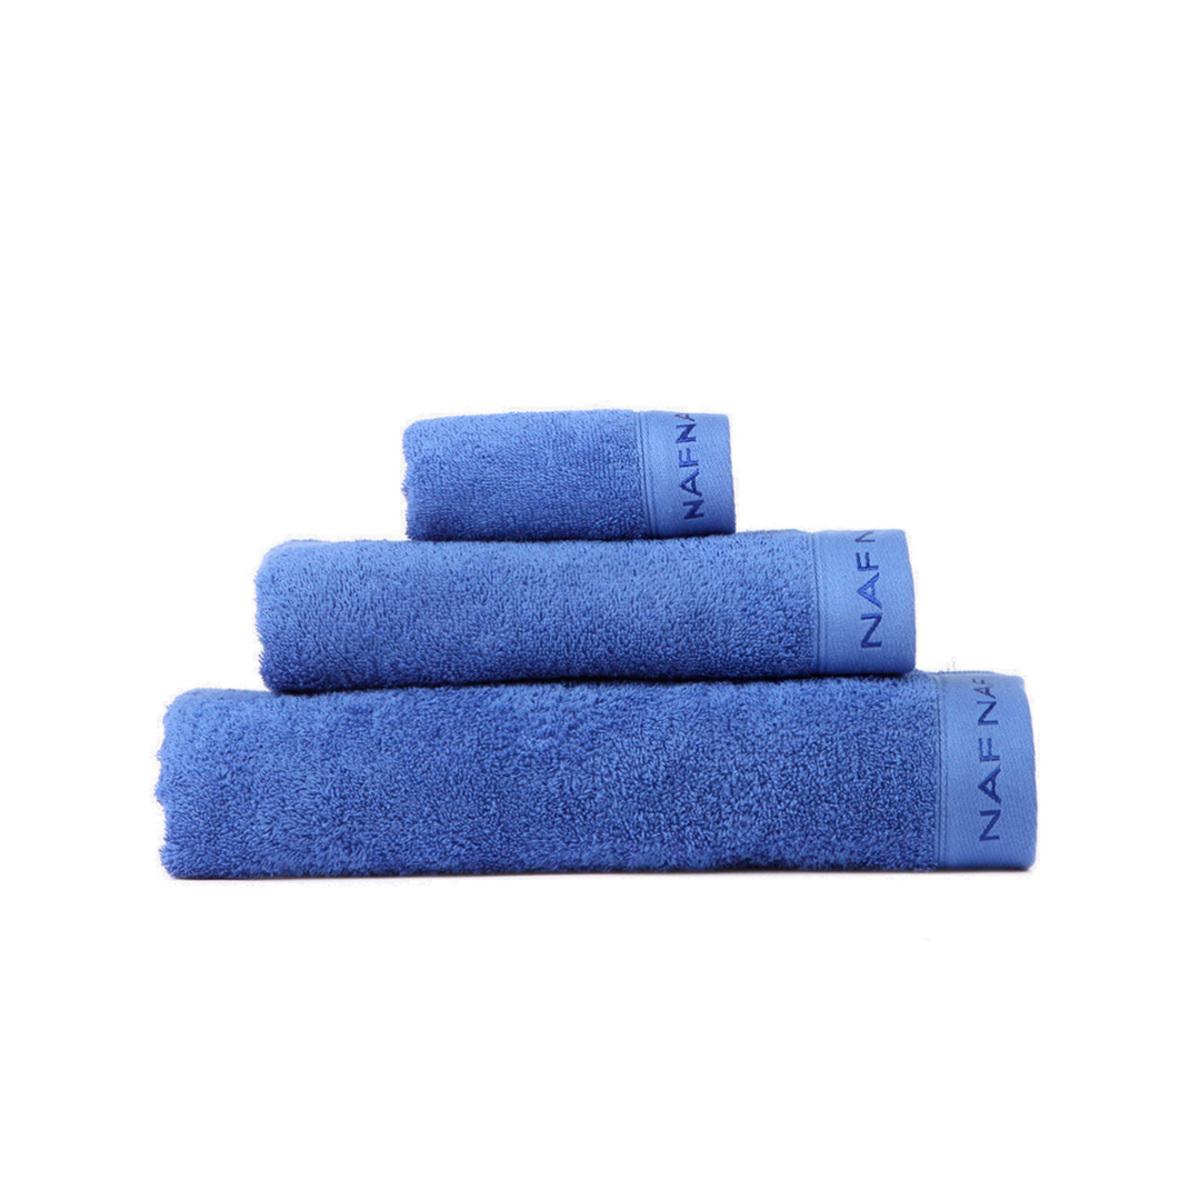 CASUAL-Set de bain trois pièces bleu mer